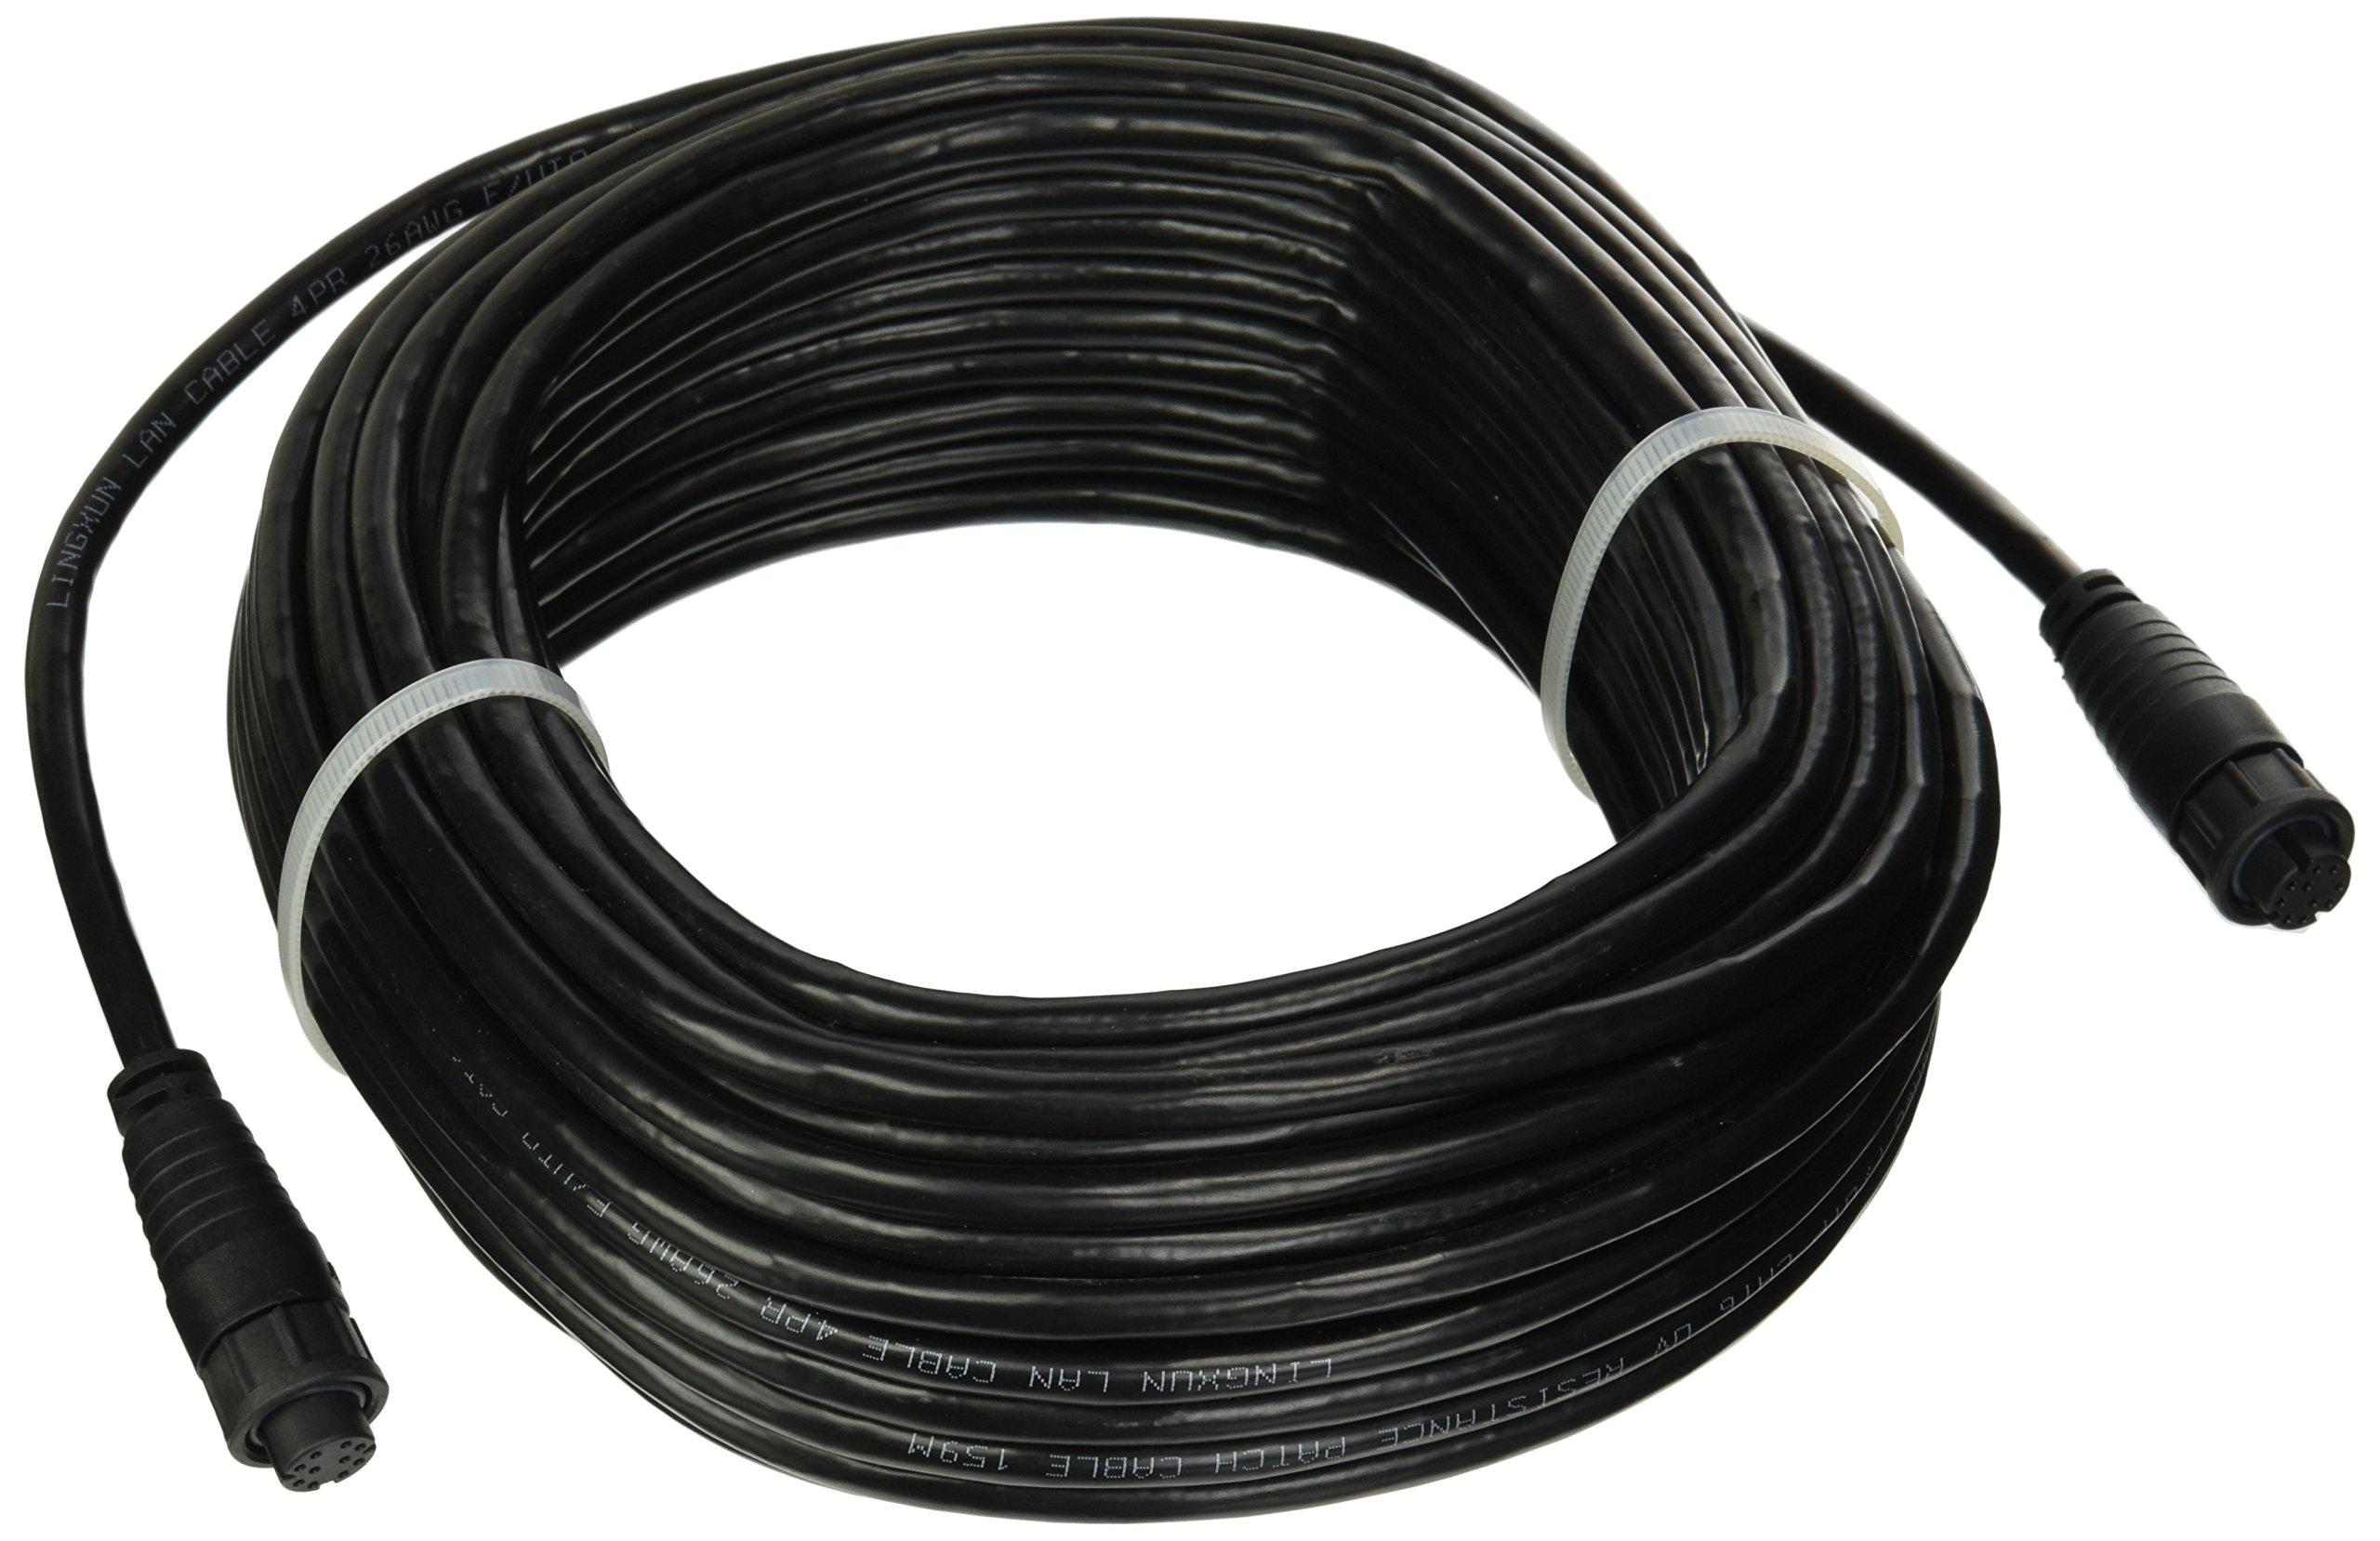 Raymarine Raynet To Raynet Cable, 20m